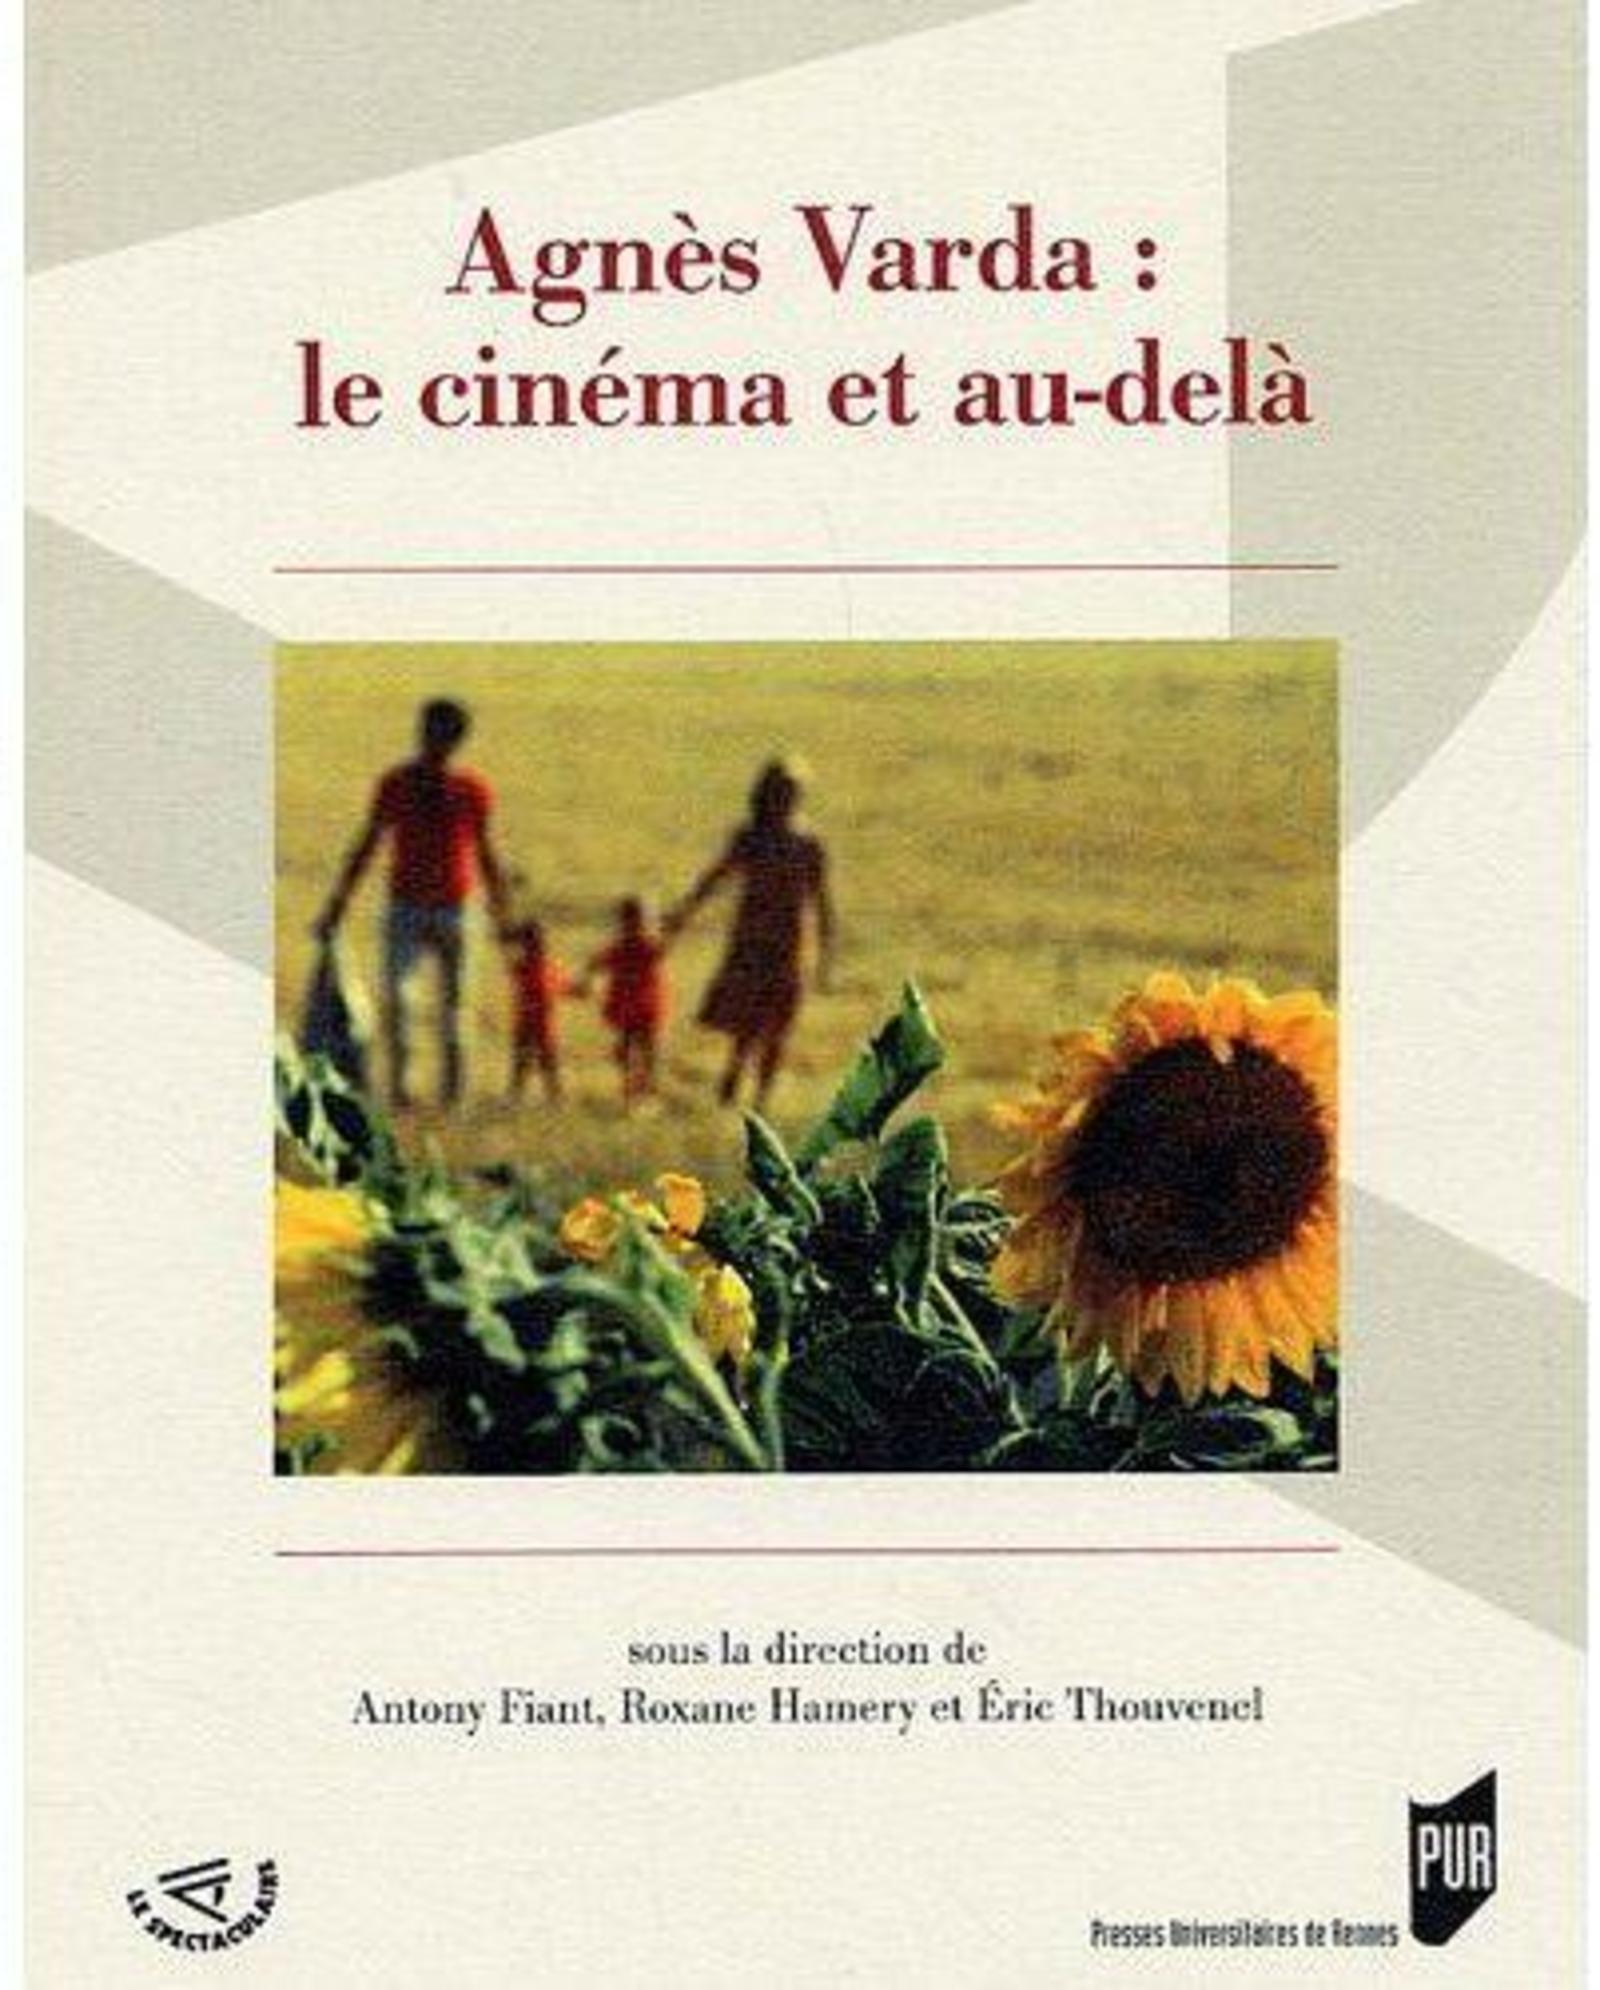 AGNES VARDA LE CINEMA ET AU-DELA